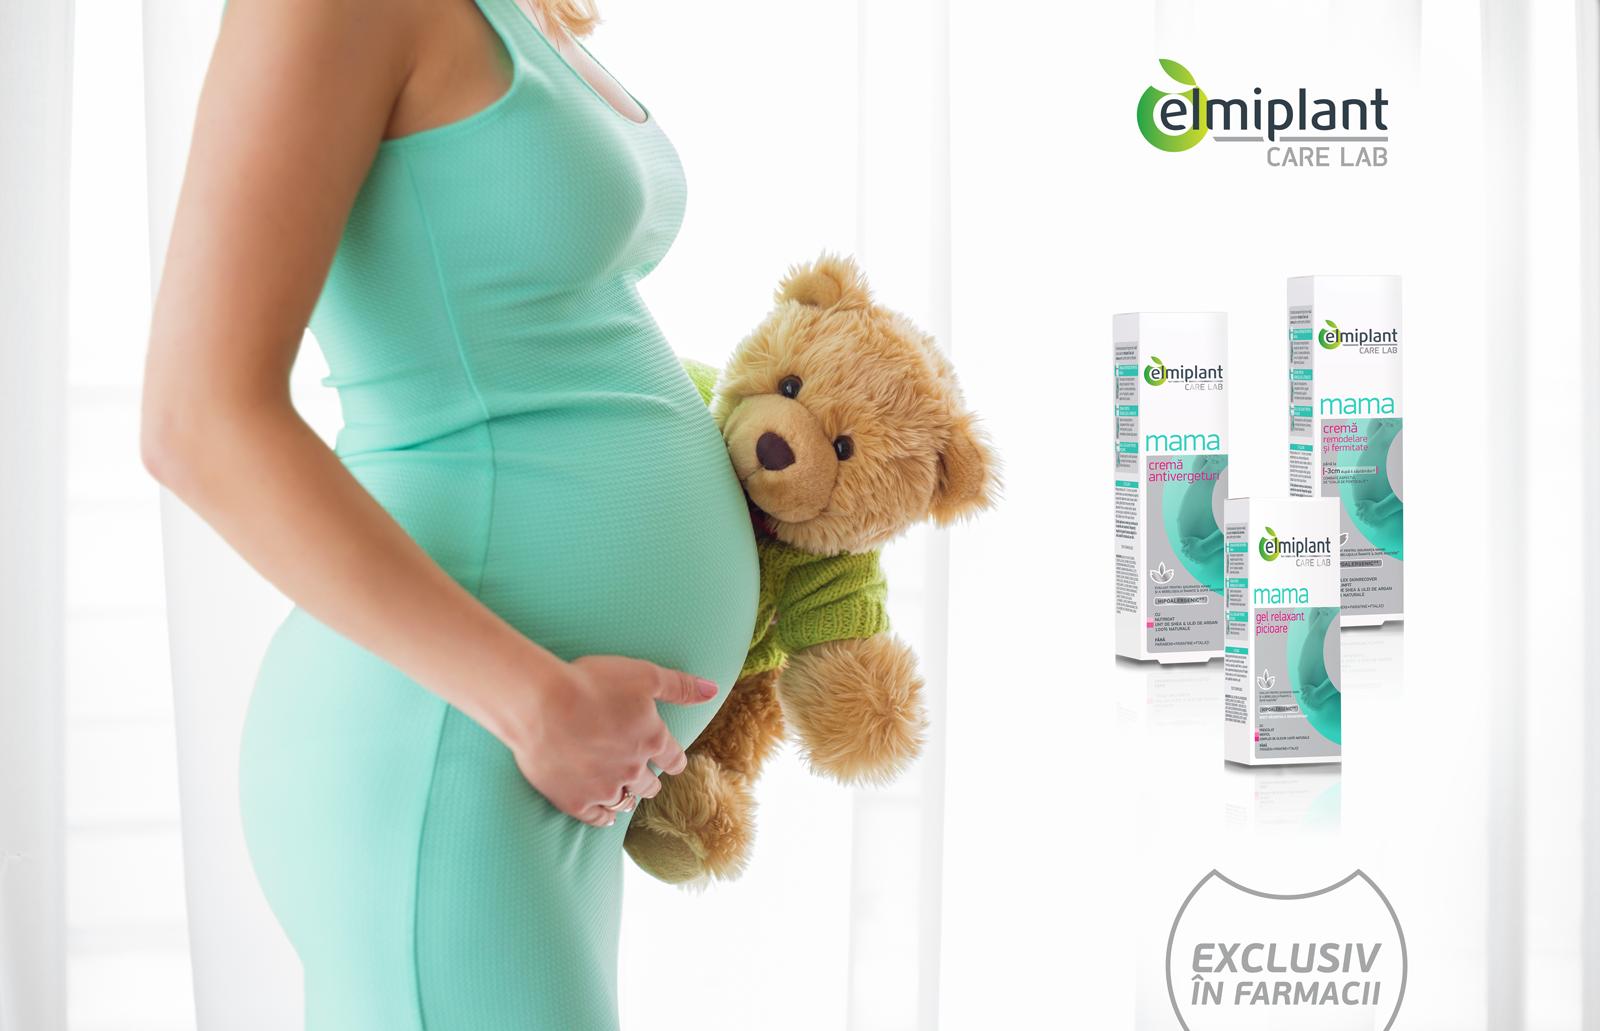 gama elmiplant care lab mama